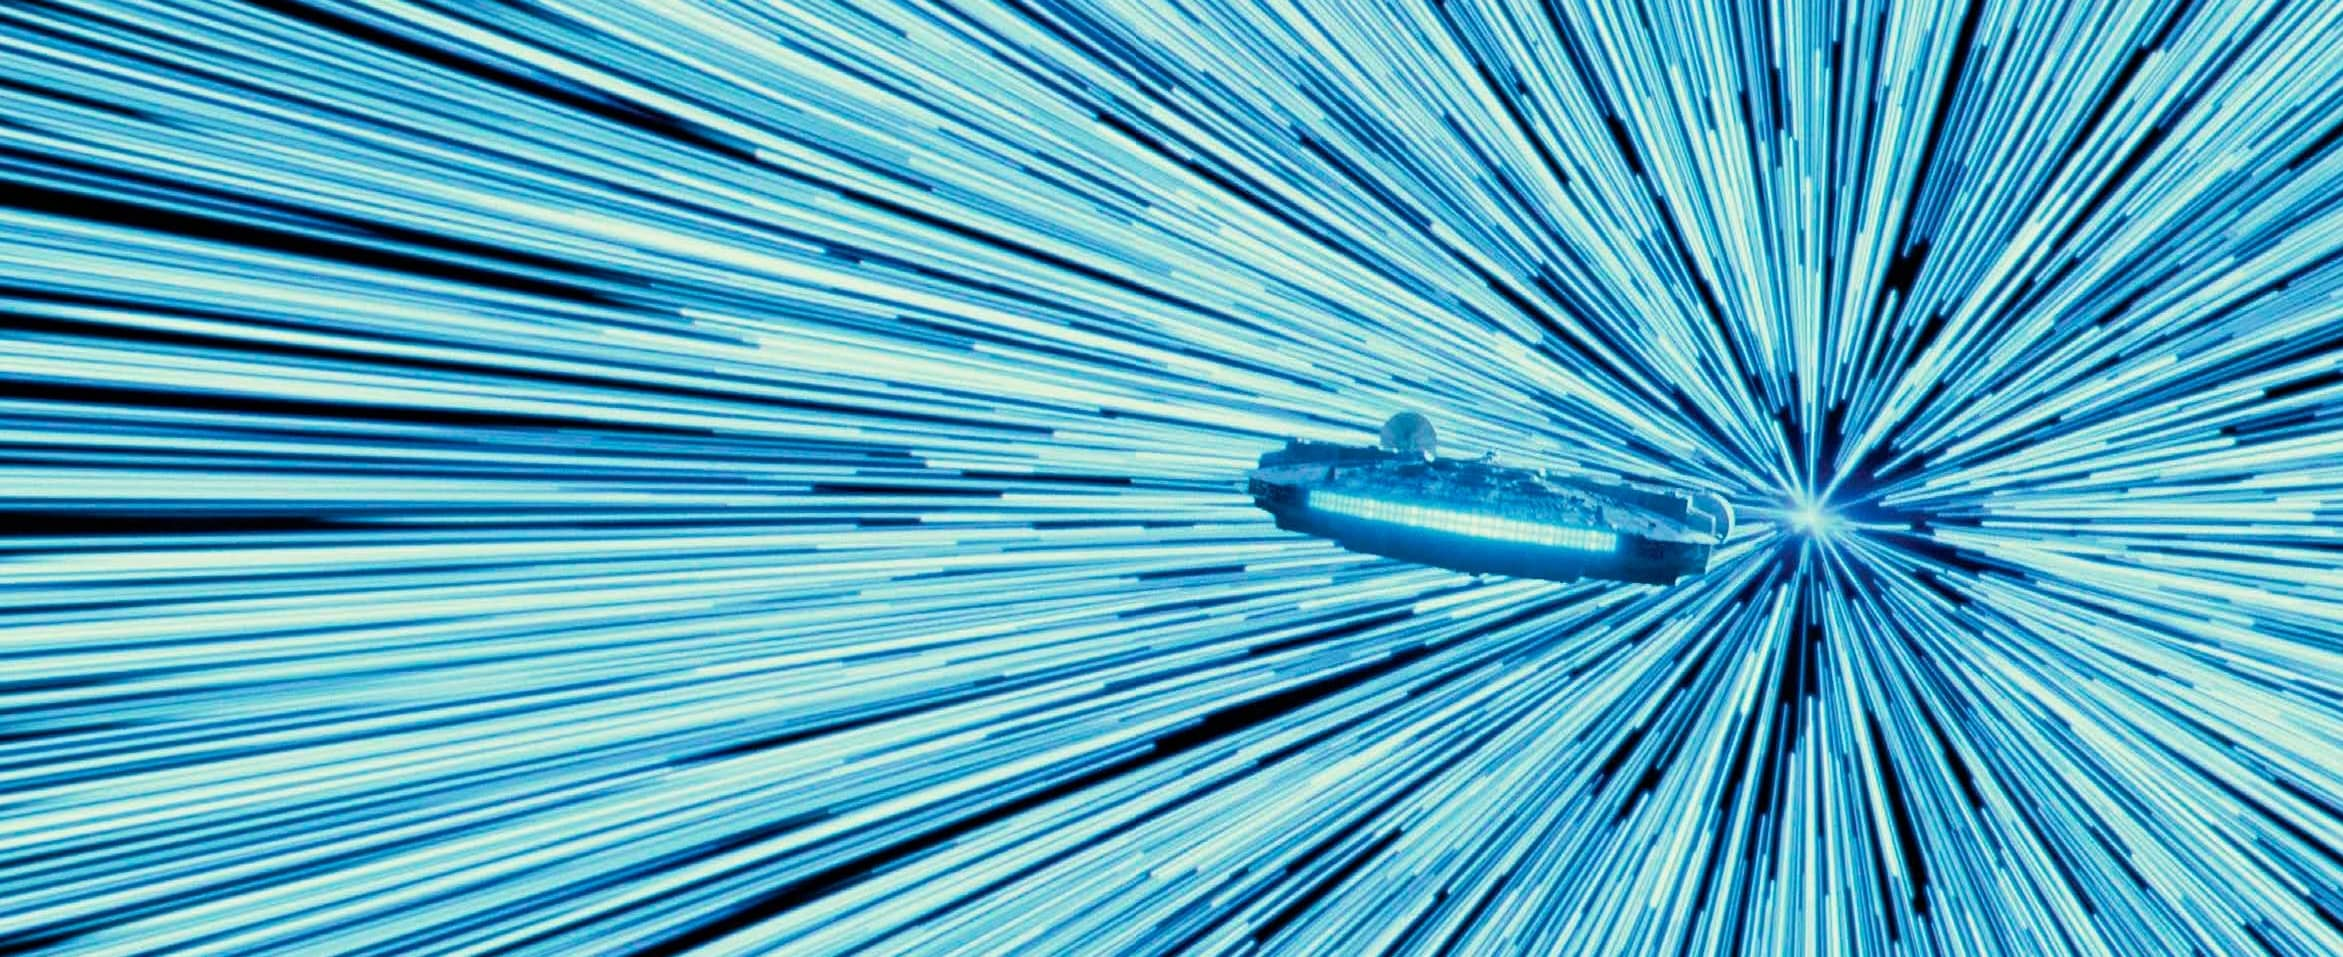 Star Wars – El fin de una era